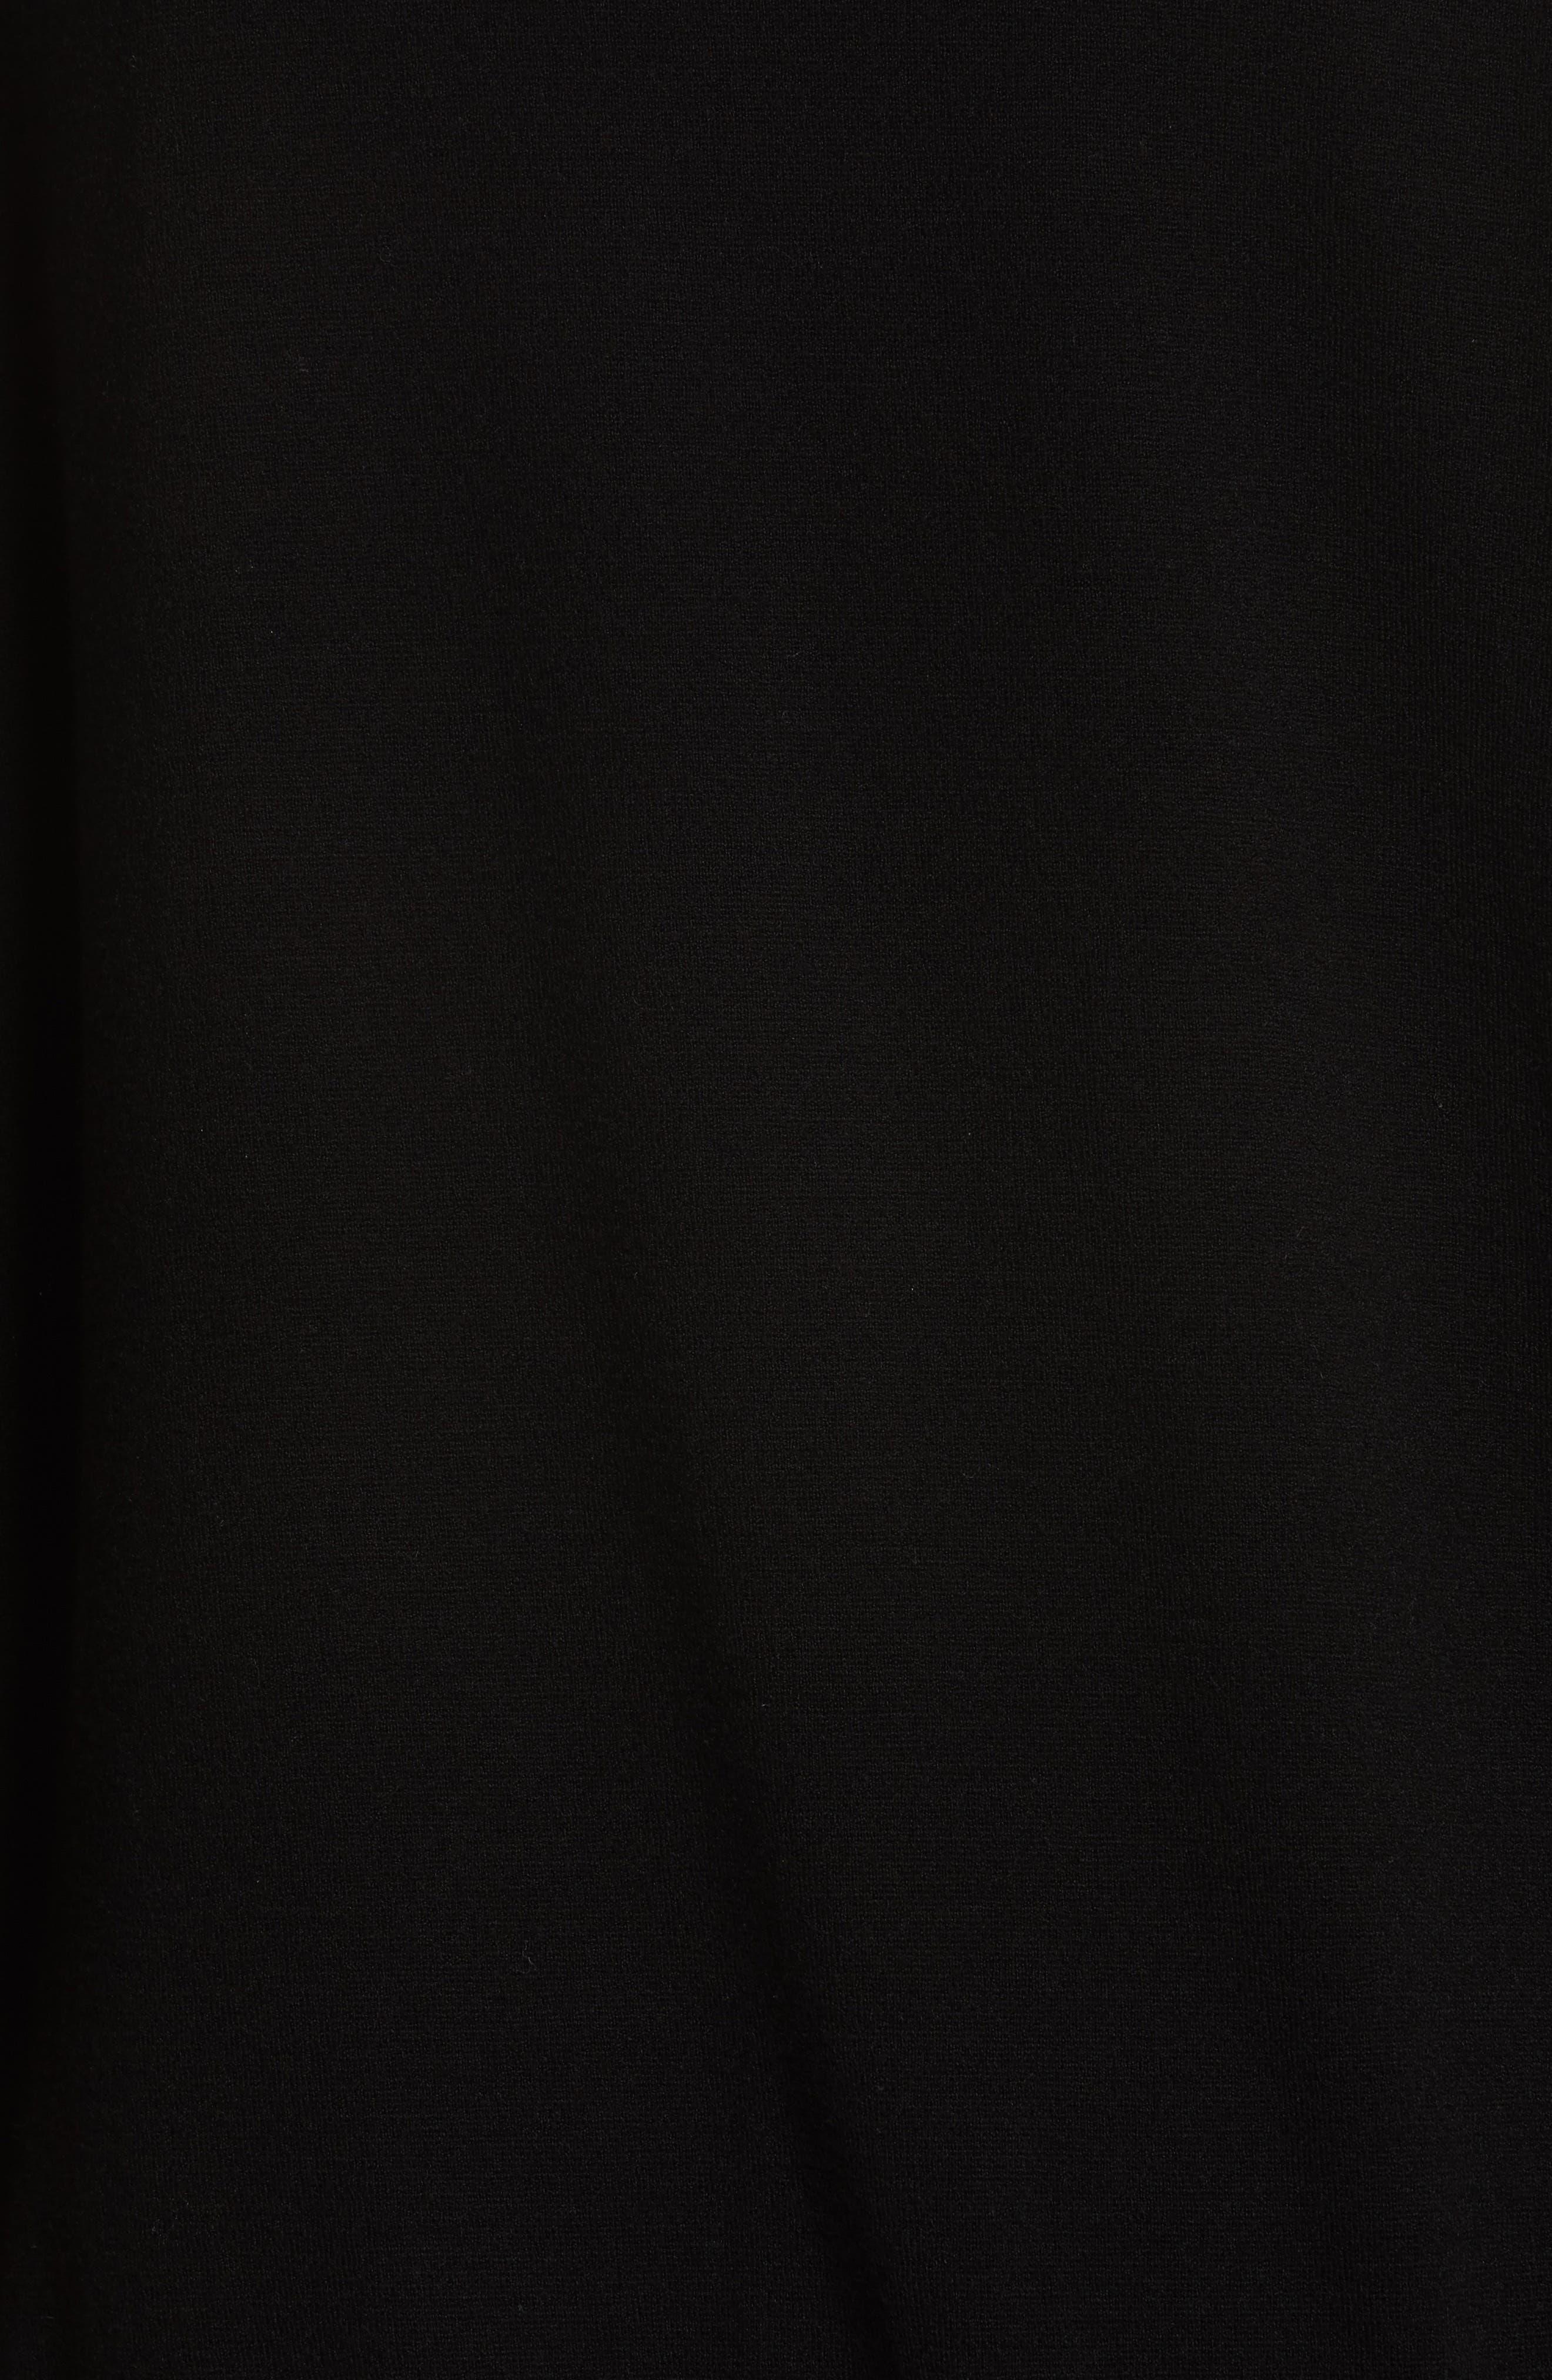 Roz Cutout Sweater,                             Alternate thumbnail 5, color,                             Black